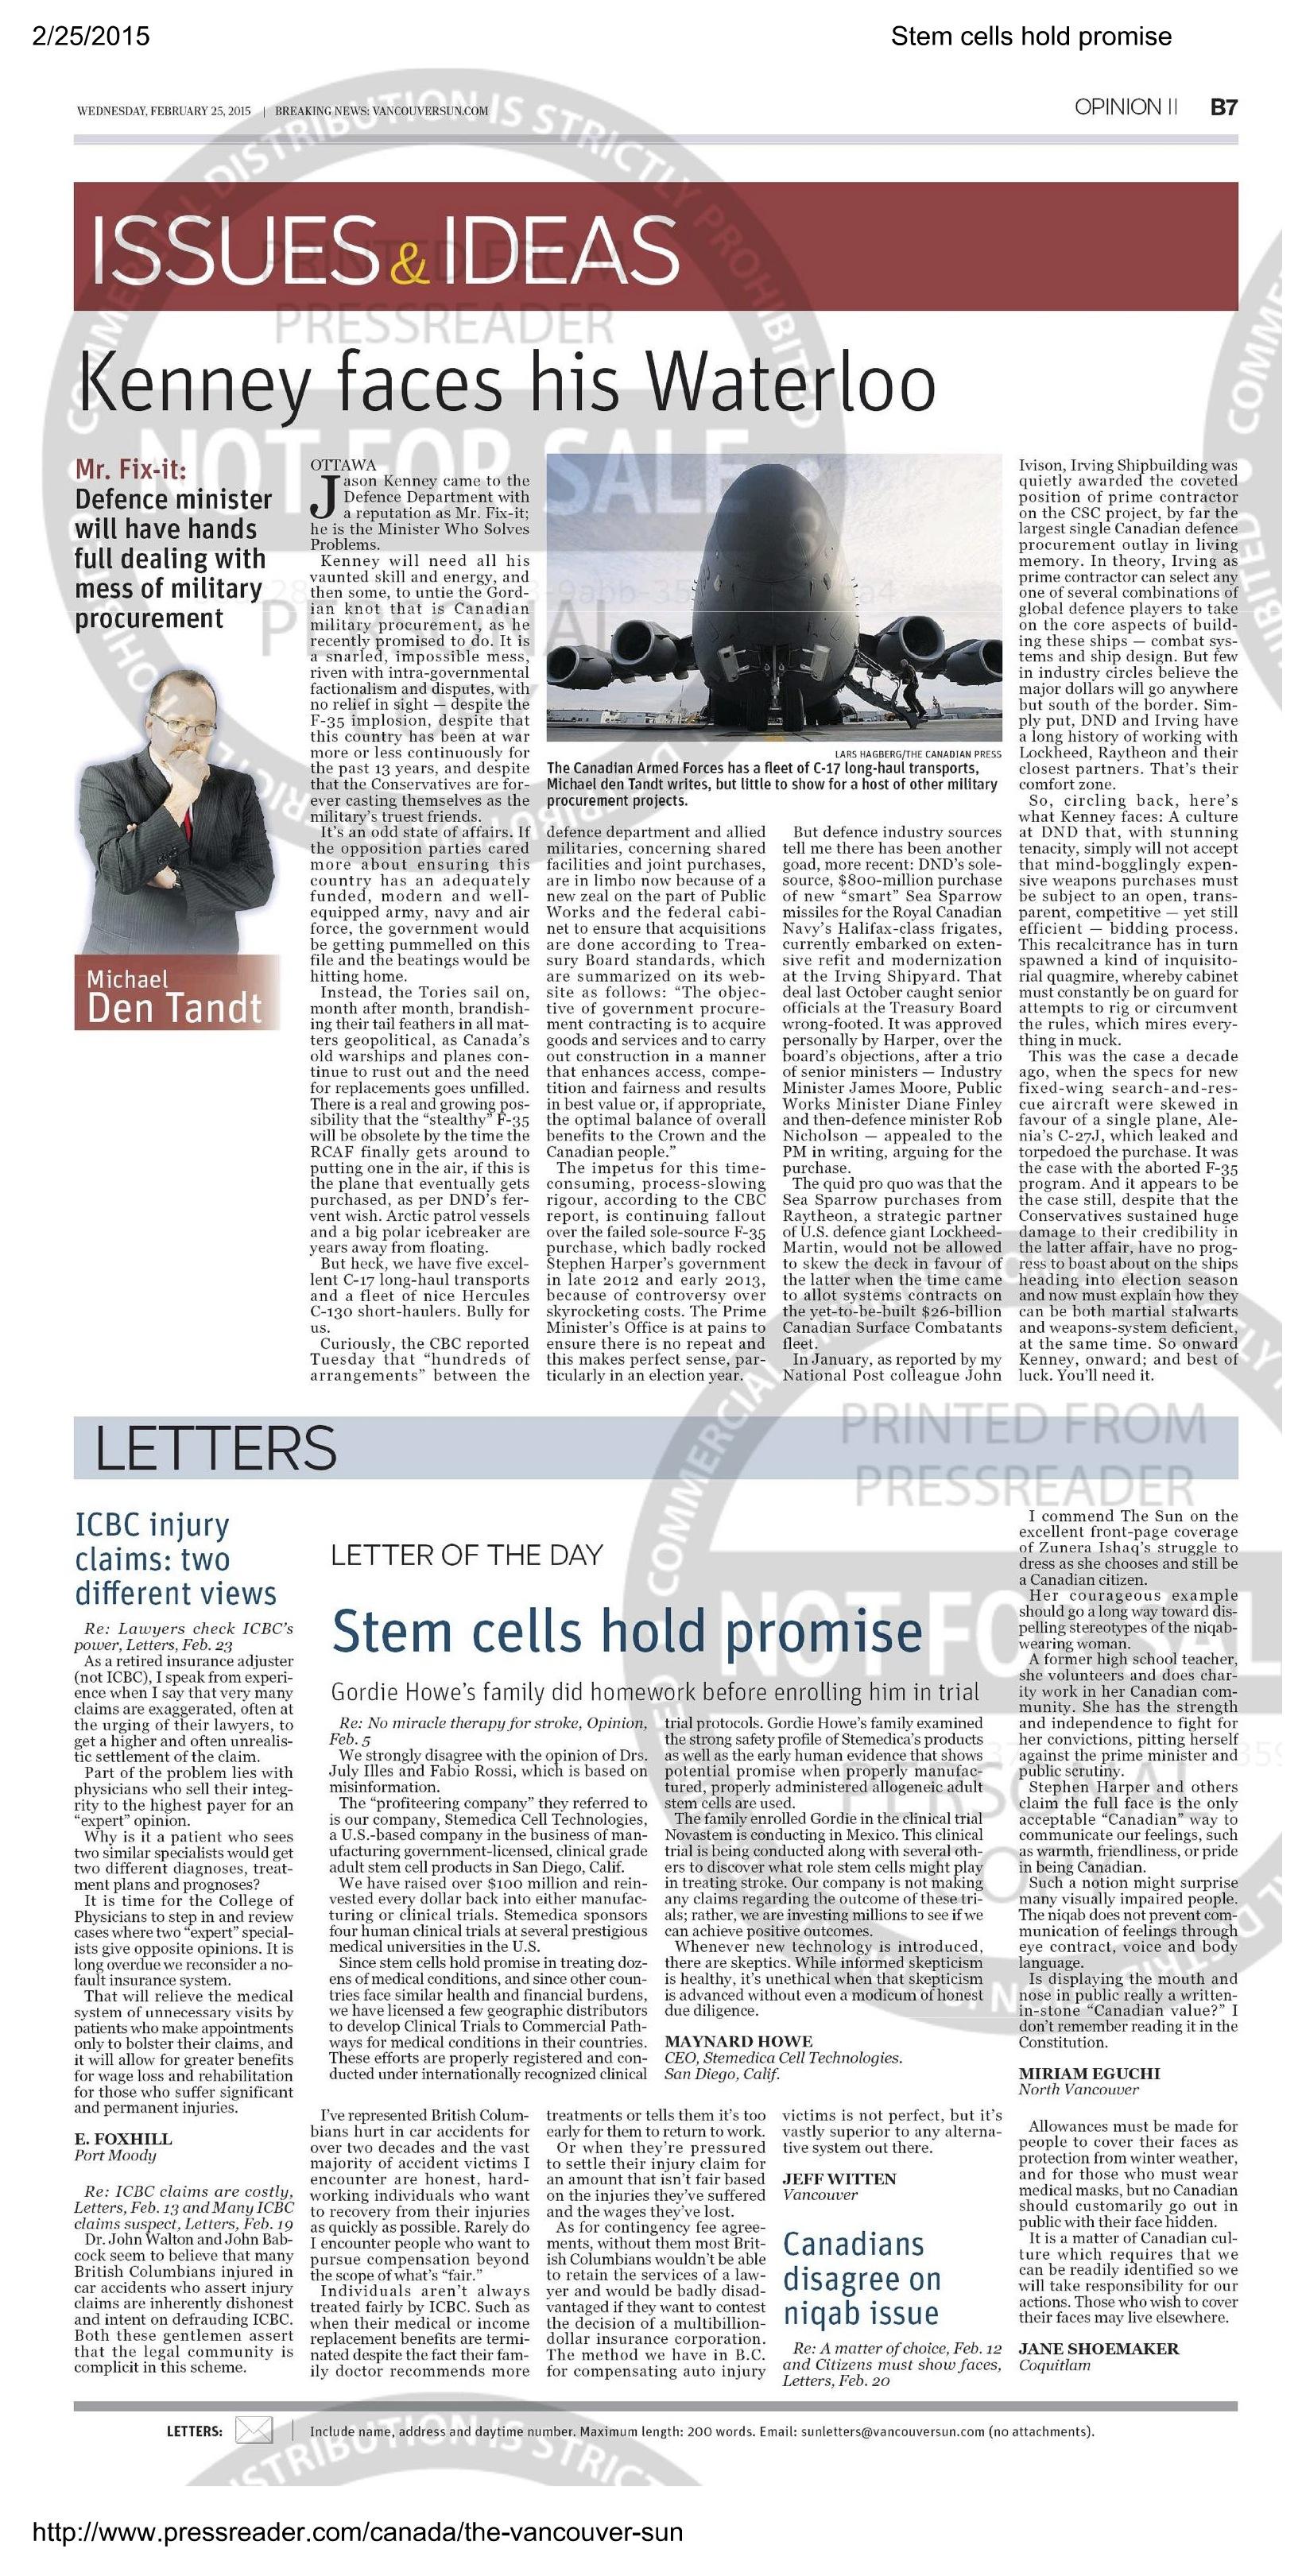 Stem cells hold promise